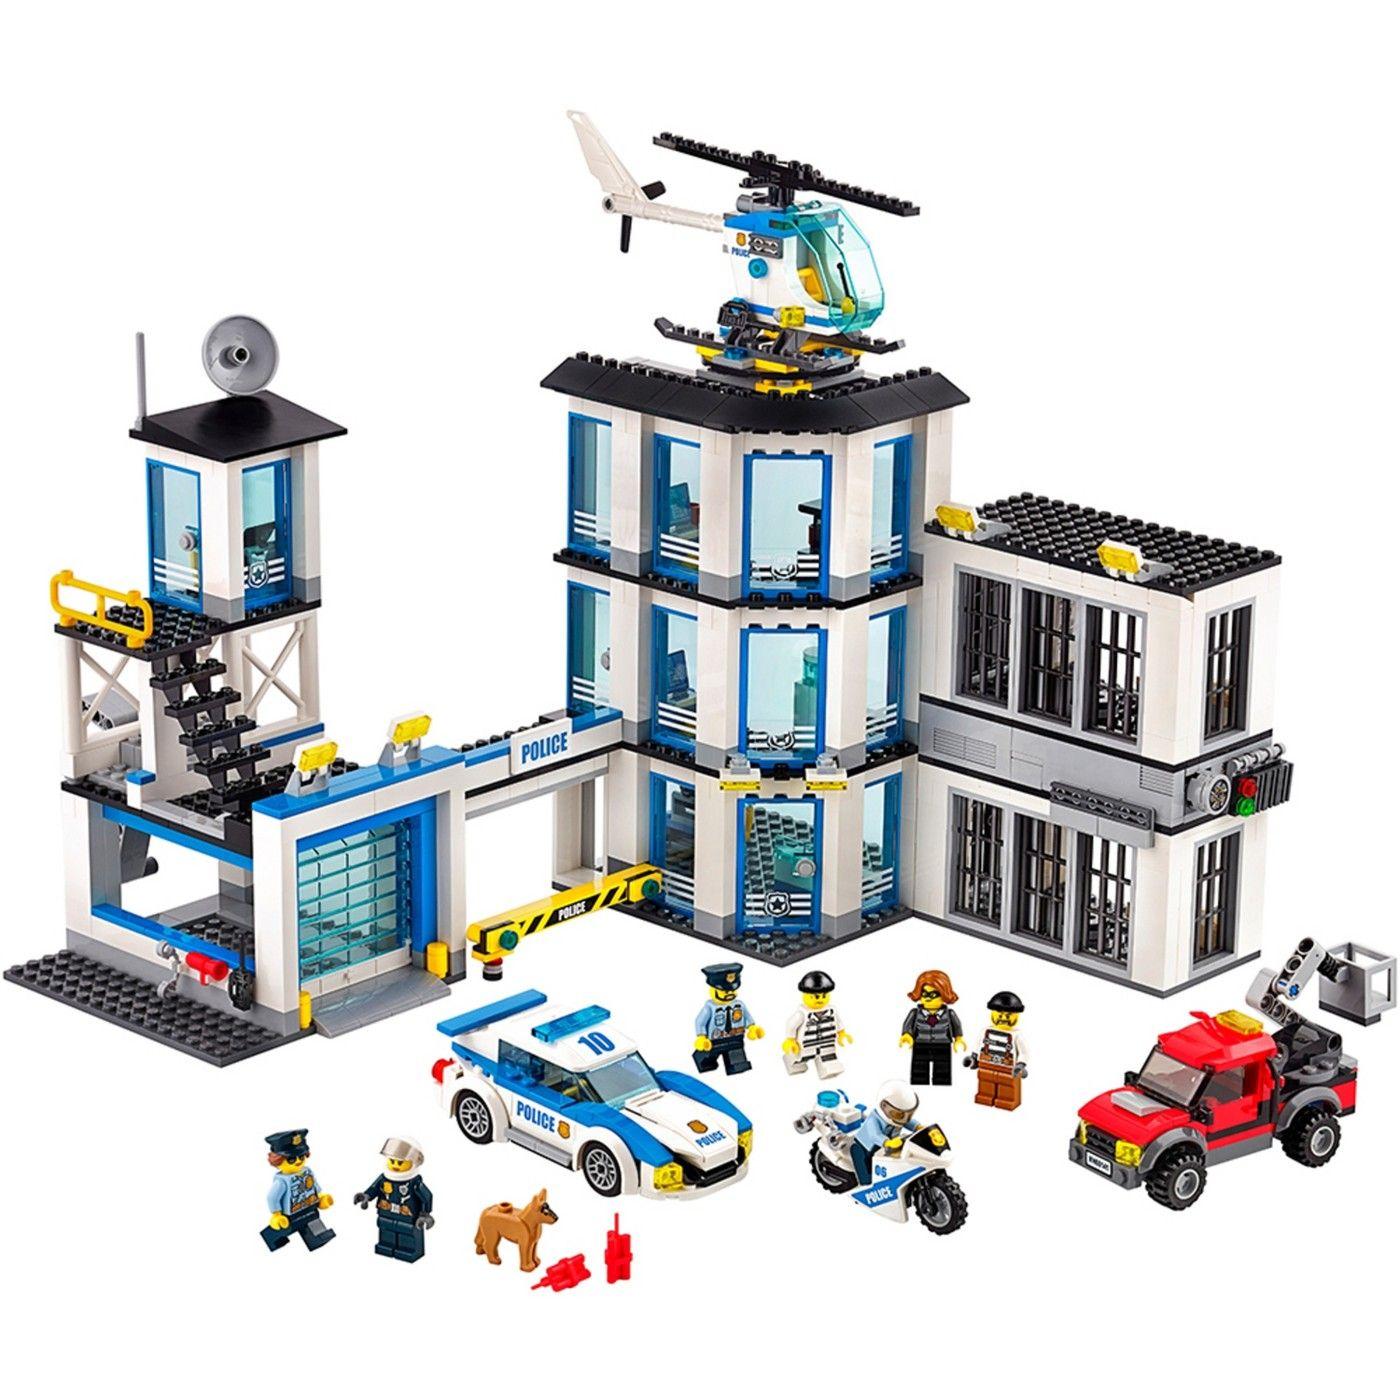 Lego City Police Police Station 60141 Image 1 Of 25 Lego City Police Station Lego Police Station Lego City Police